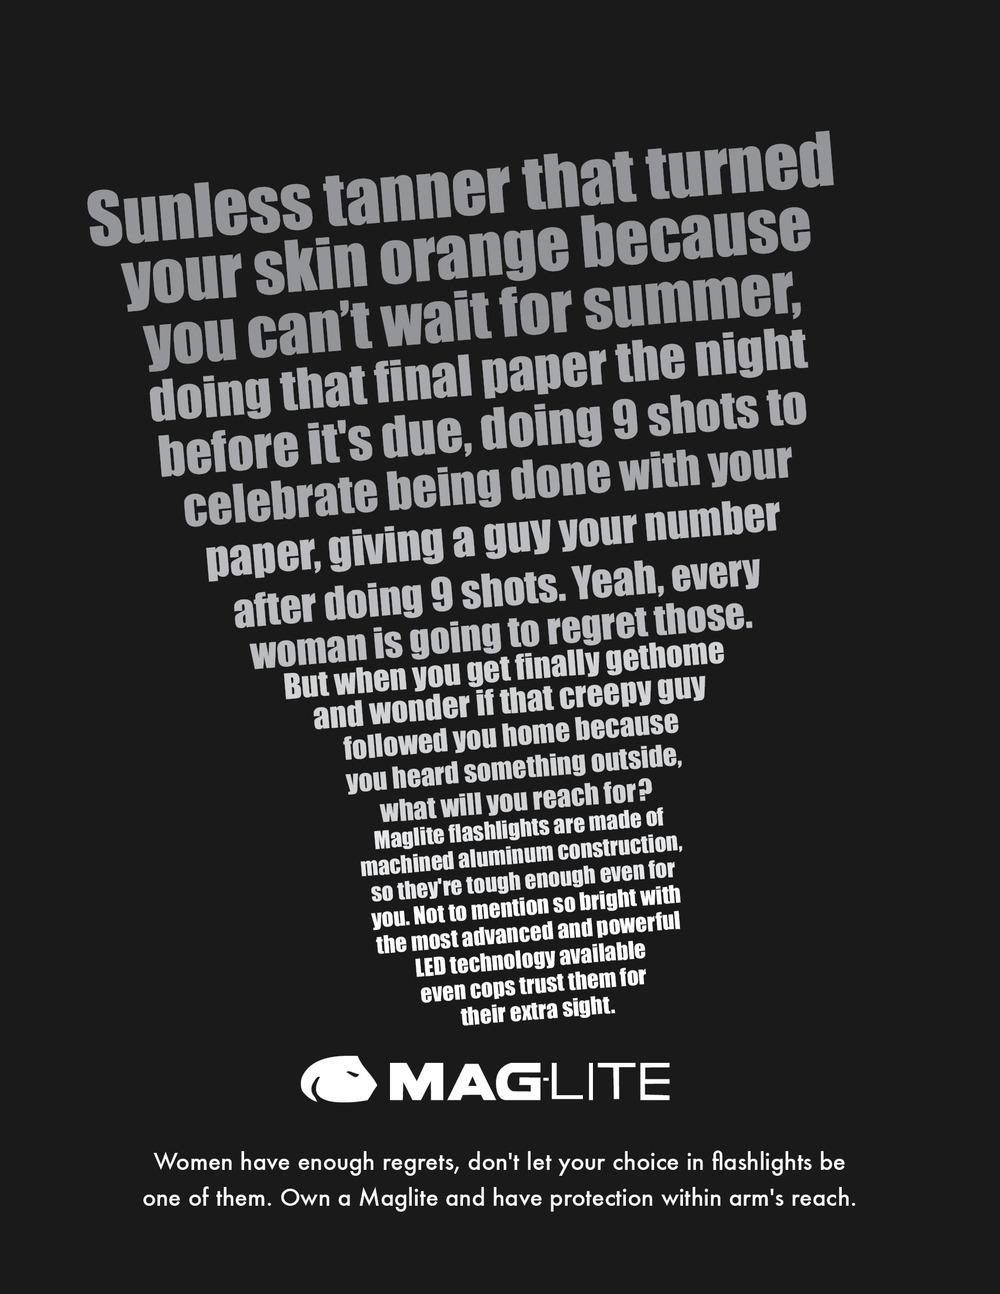 Maglite_Ad3_v3.jpg